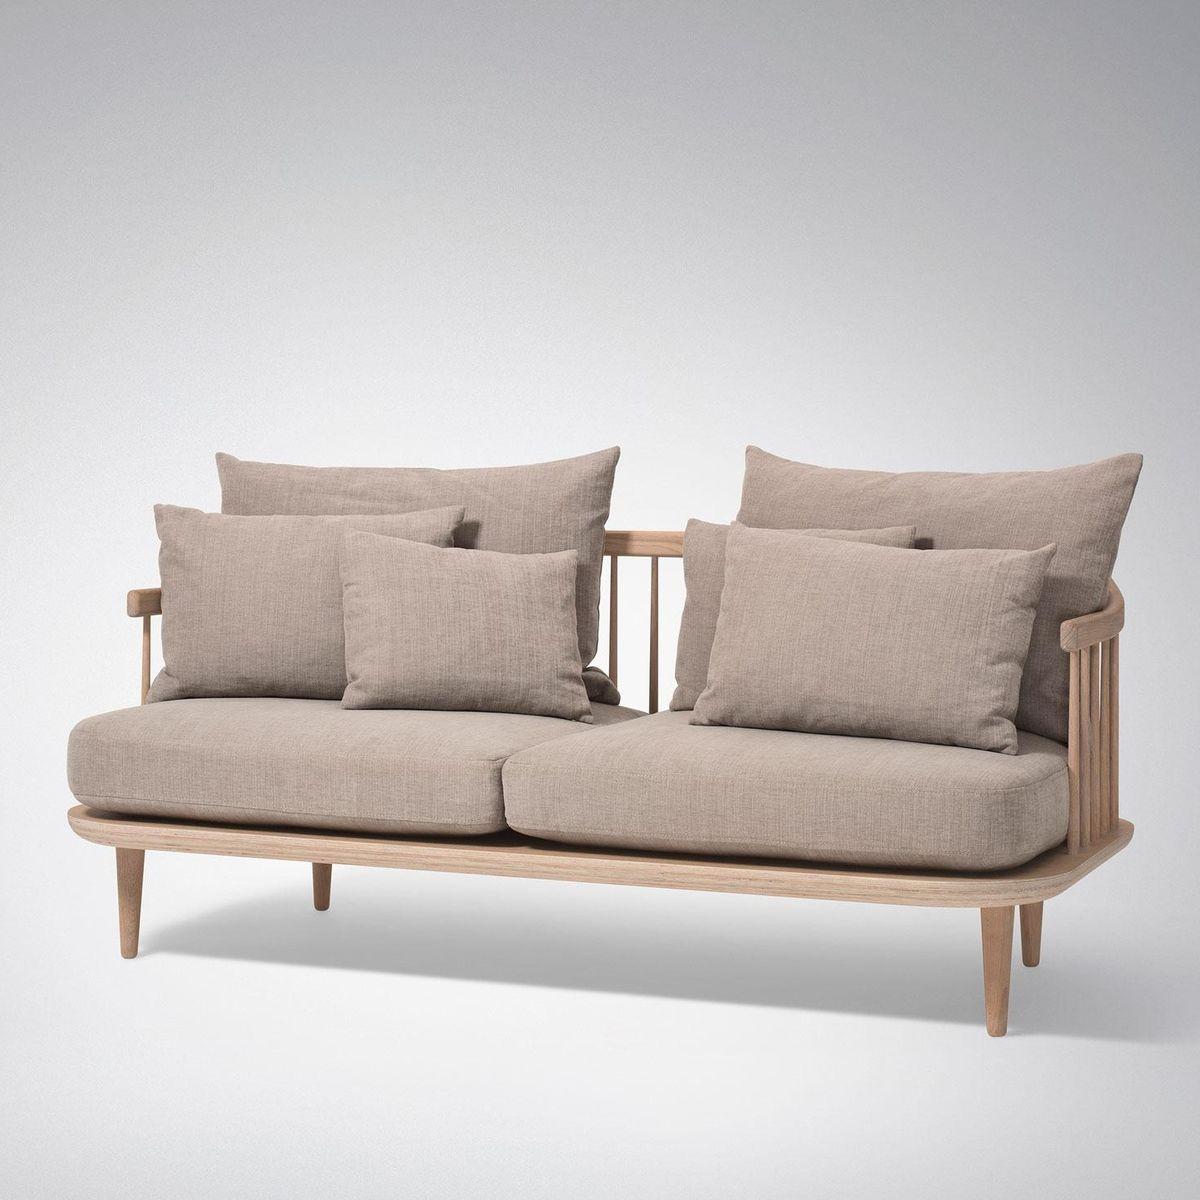 stilvolle wei e m bel welche wandfarbe fotos erindzain. Black Bedroom Furniture Sets. Home Design Ideas